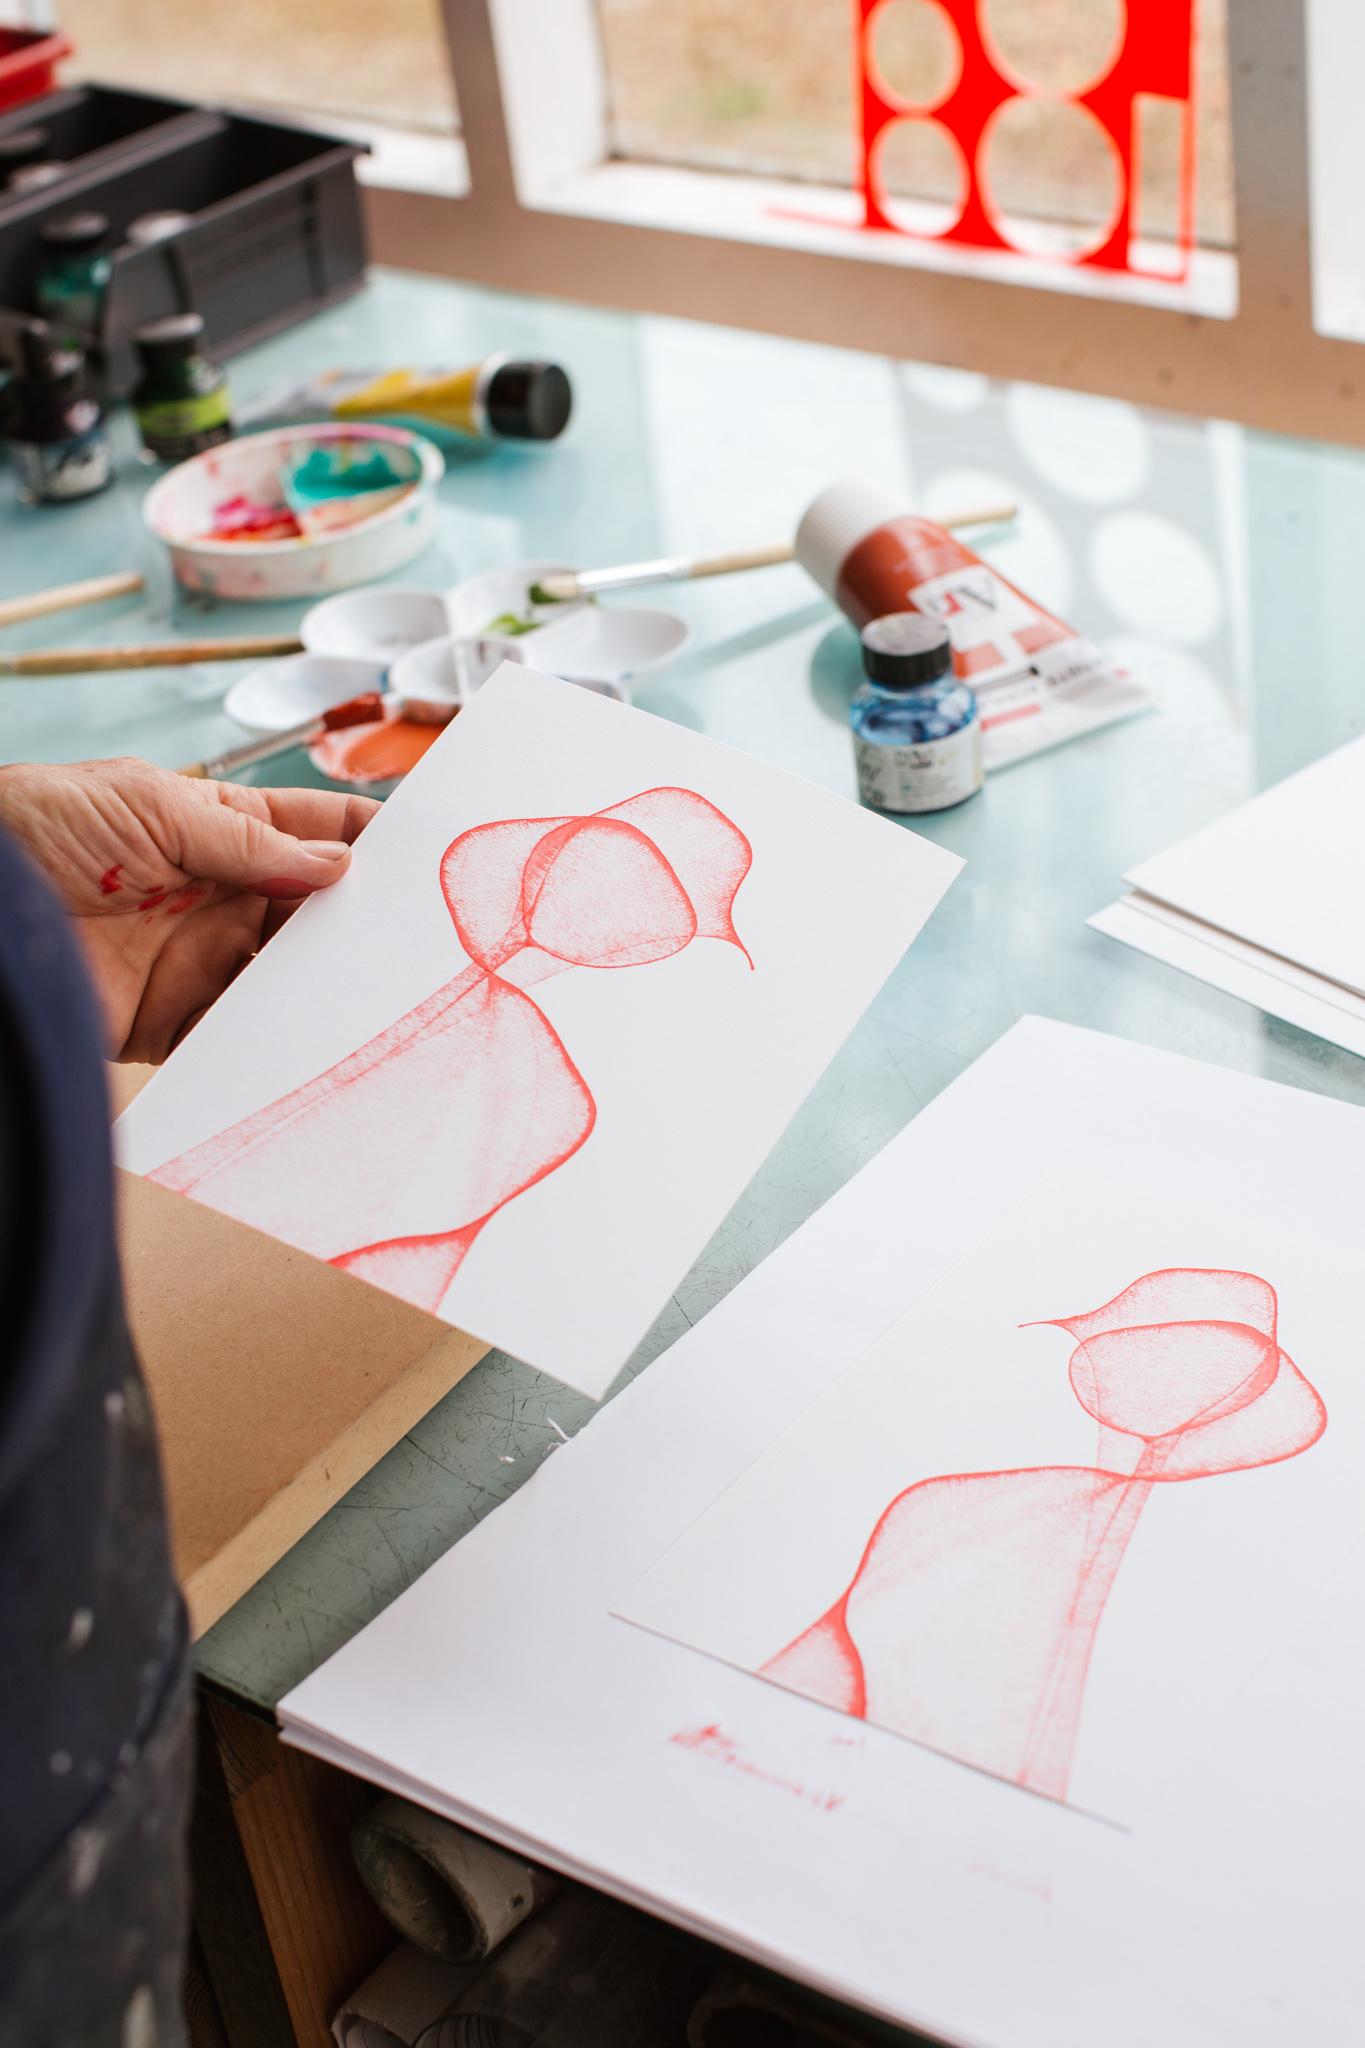 Lifestyle-artist-studio-Joanne-Crawford-Leeds-8.JPG